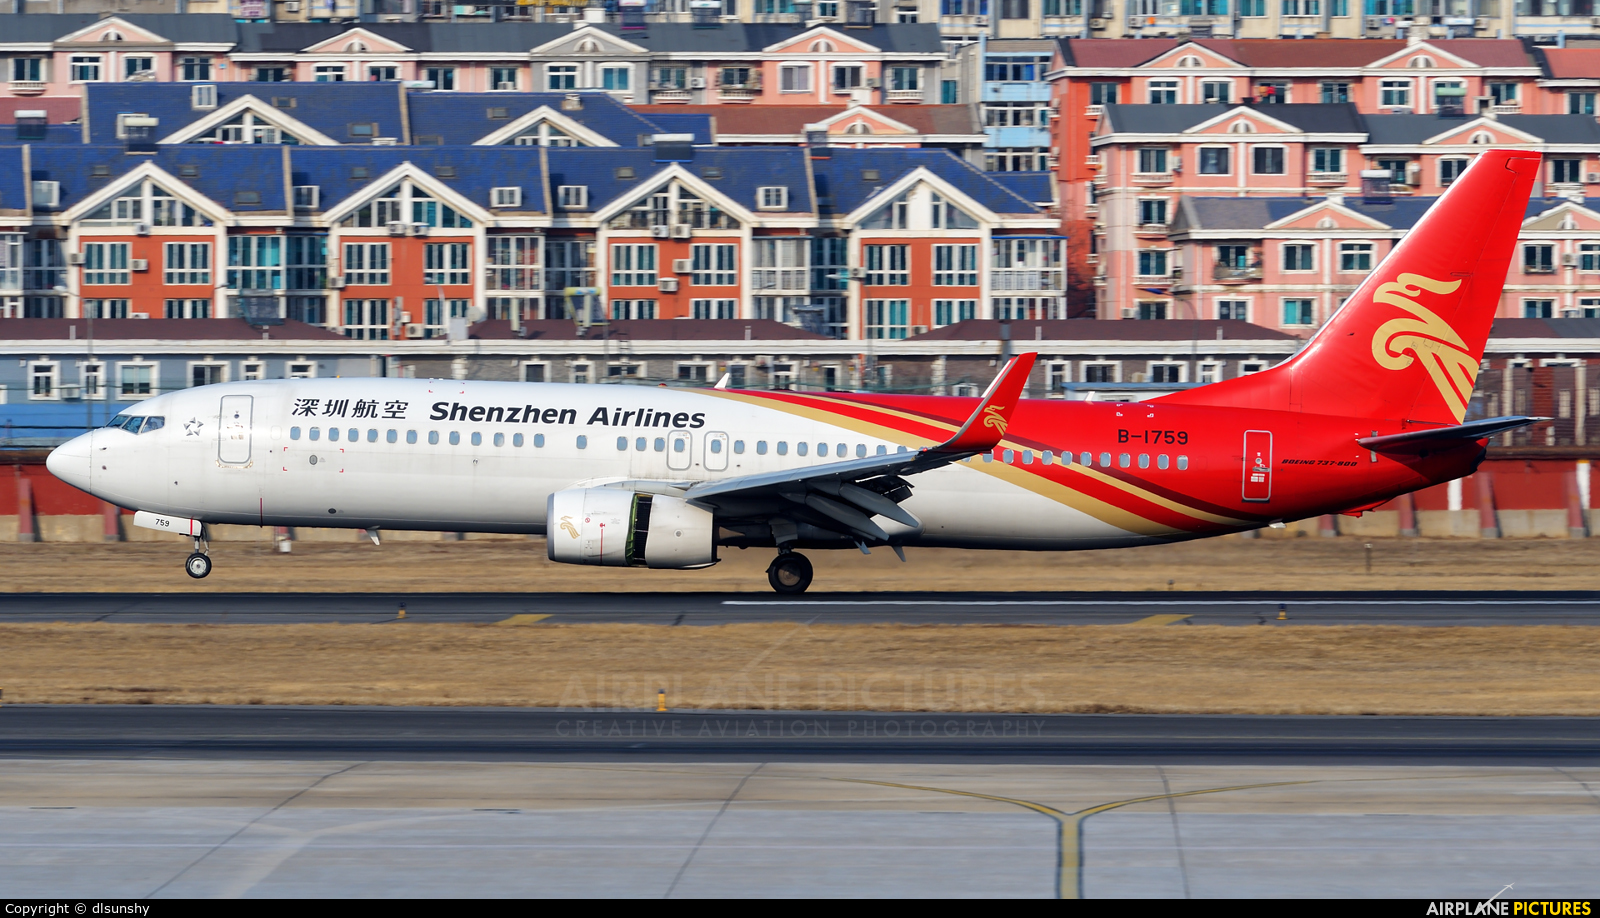 Shenzhen Airlines B-1759 aircraft at Dalian Zhoushuizi Int'l